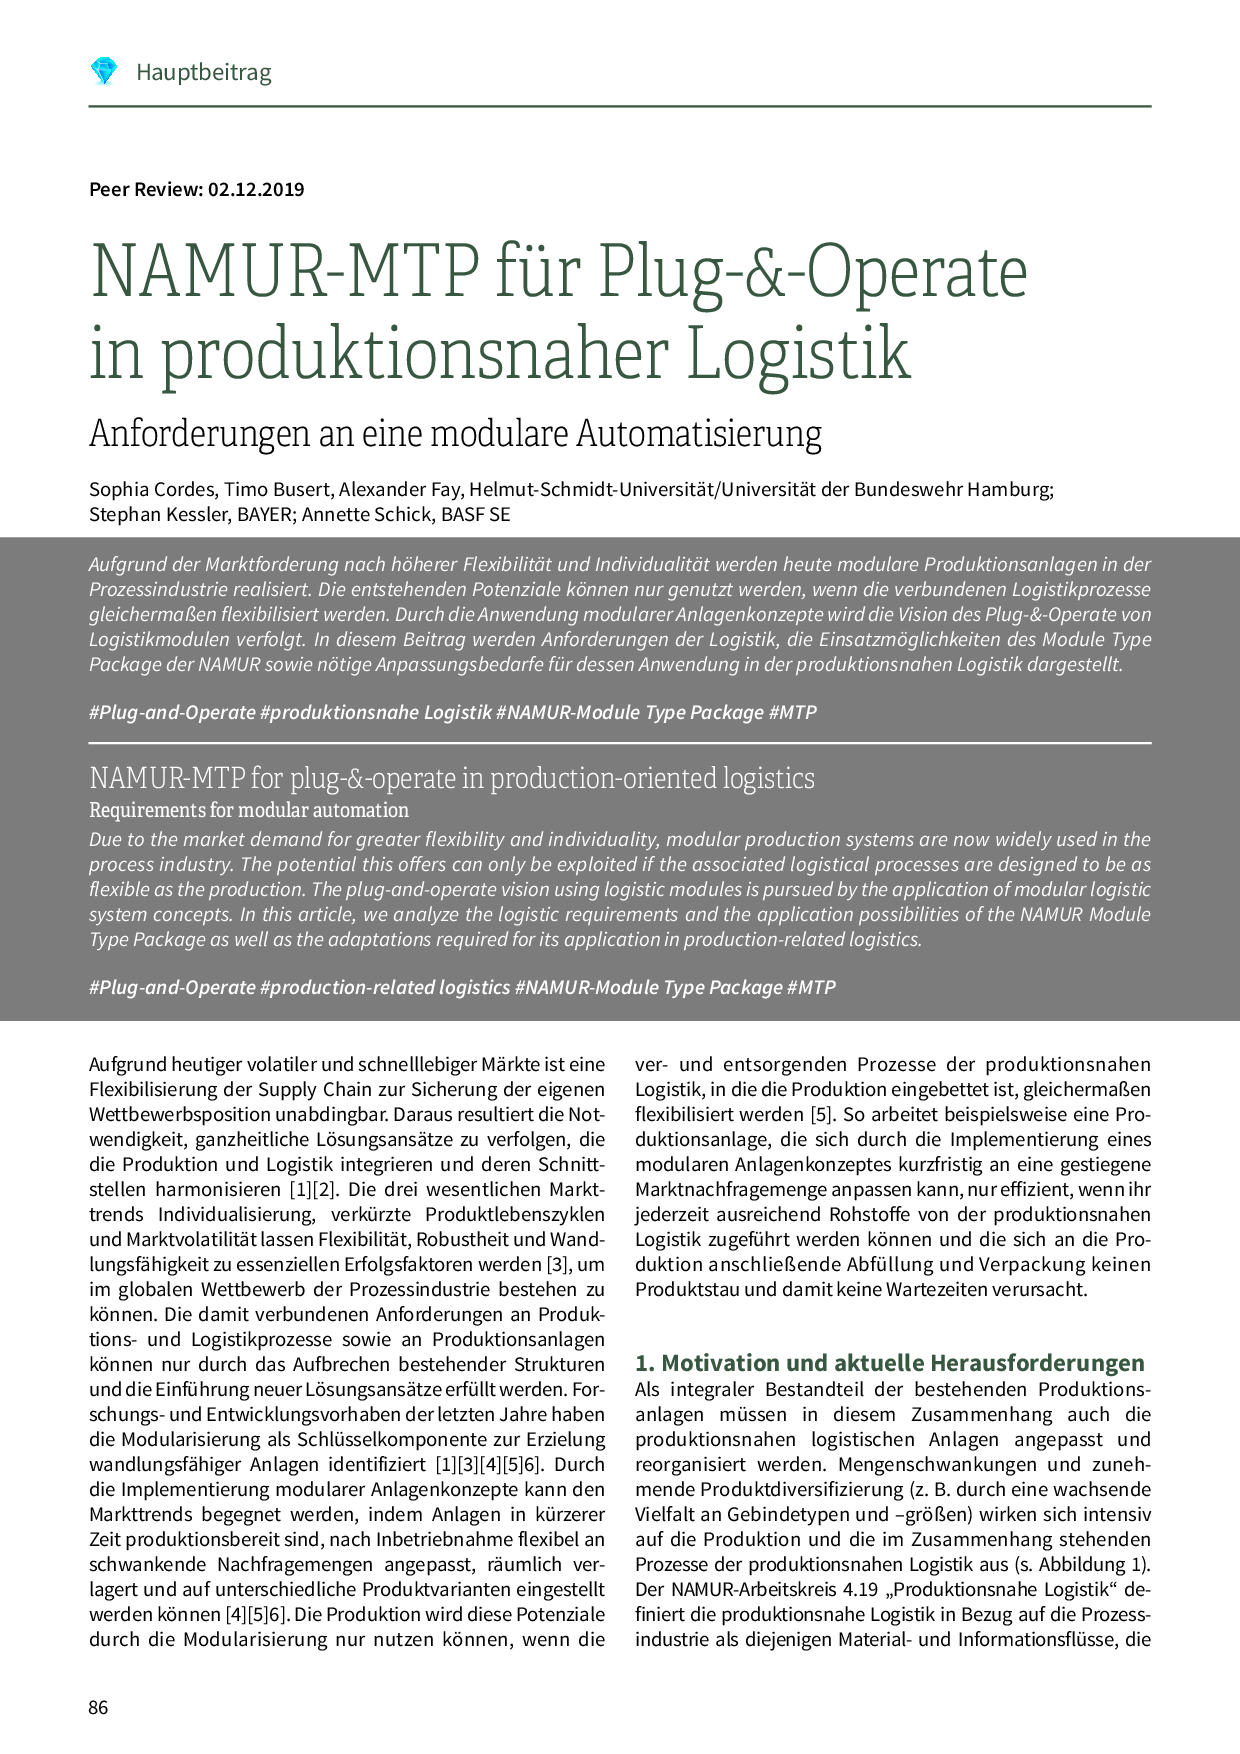 NAMUR-MTP für Plug-&-Operate in produktionsnaher Logistik